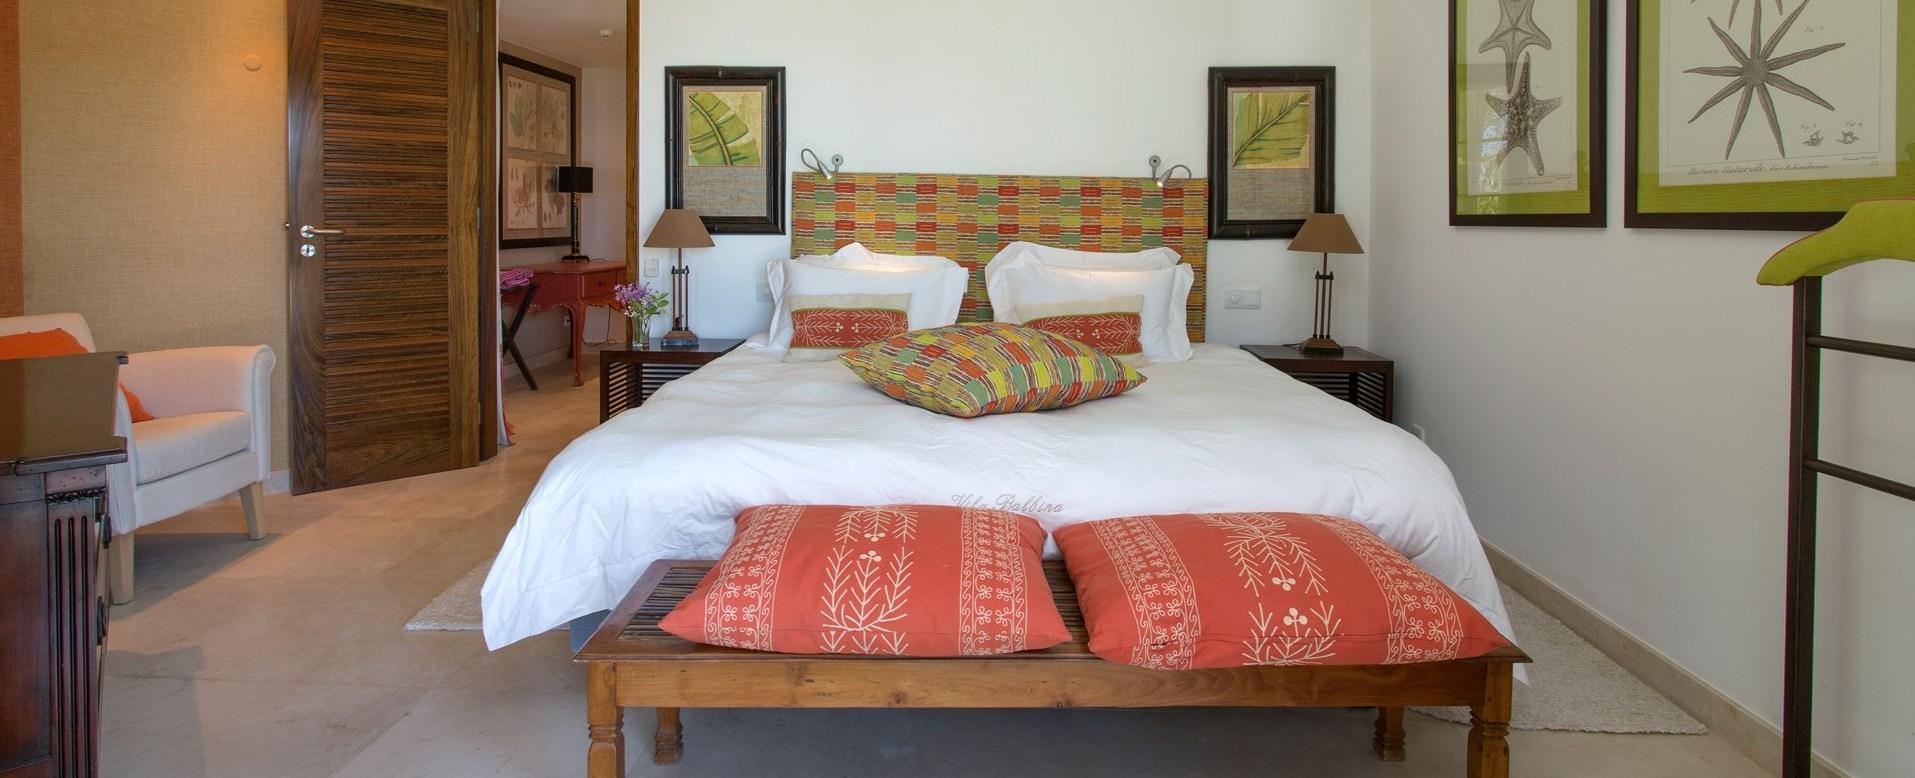 villa-balbina-double-bedroom